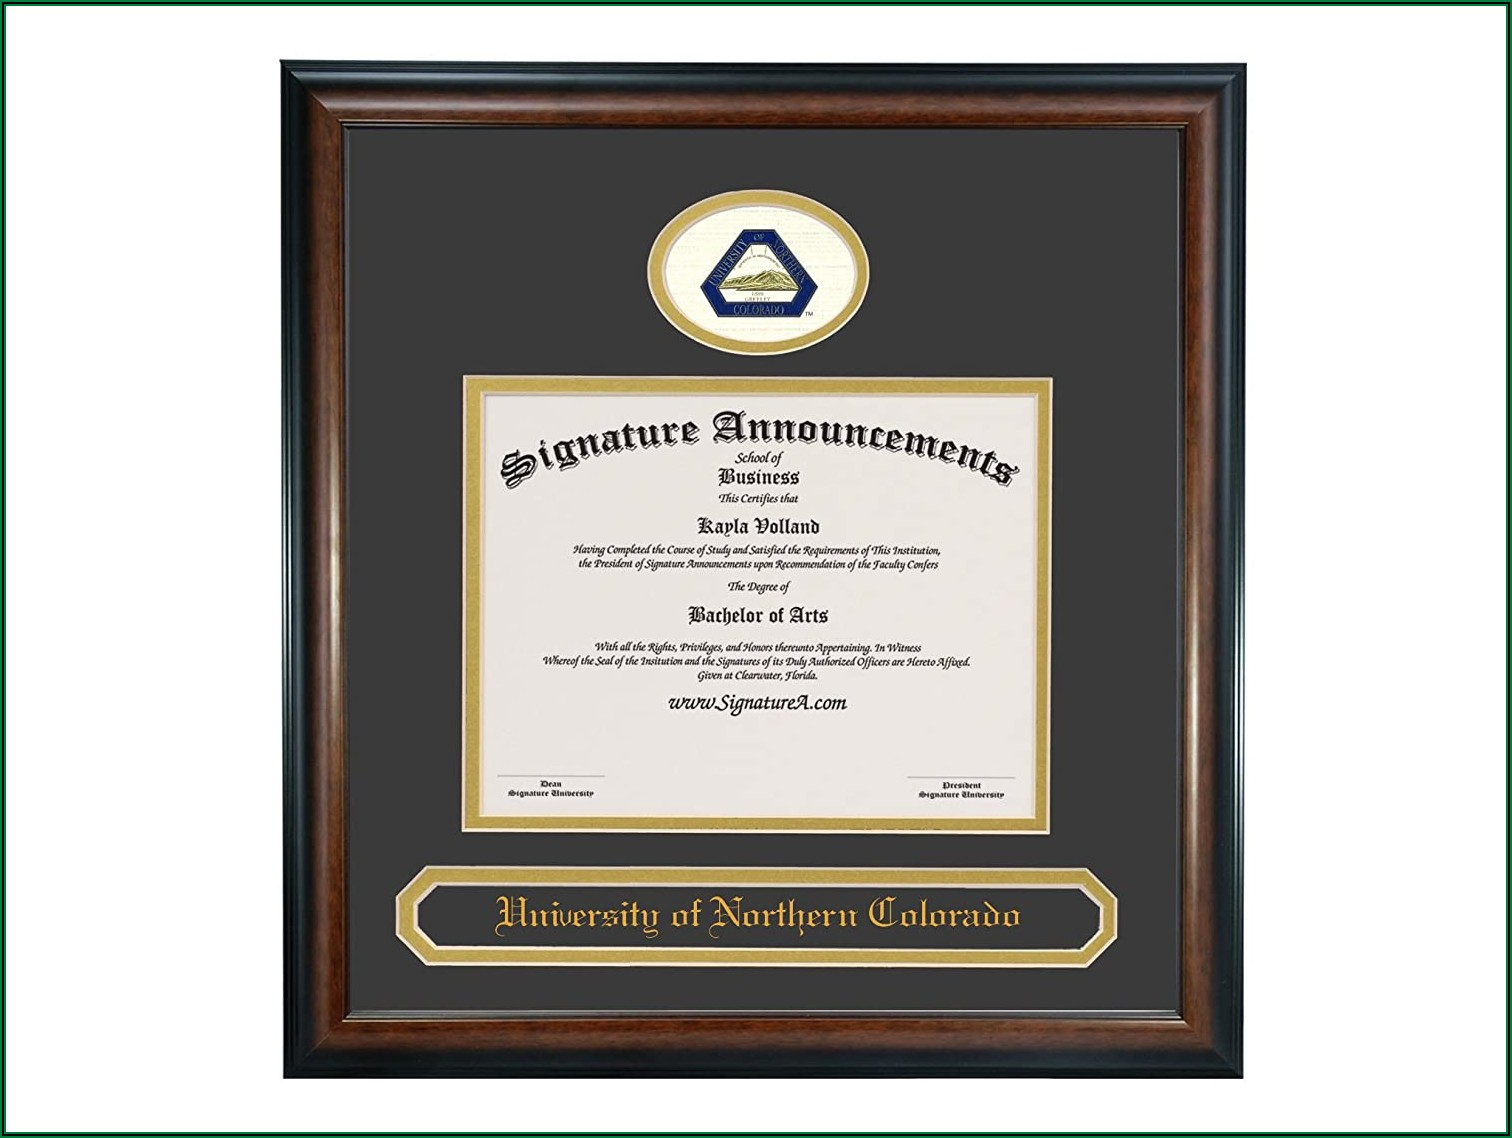 University Of Northern Colorado Graduation Announcements